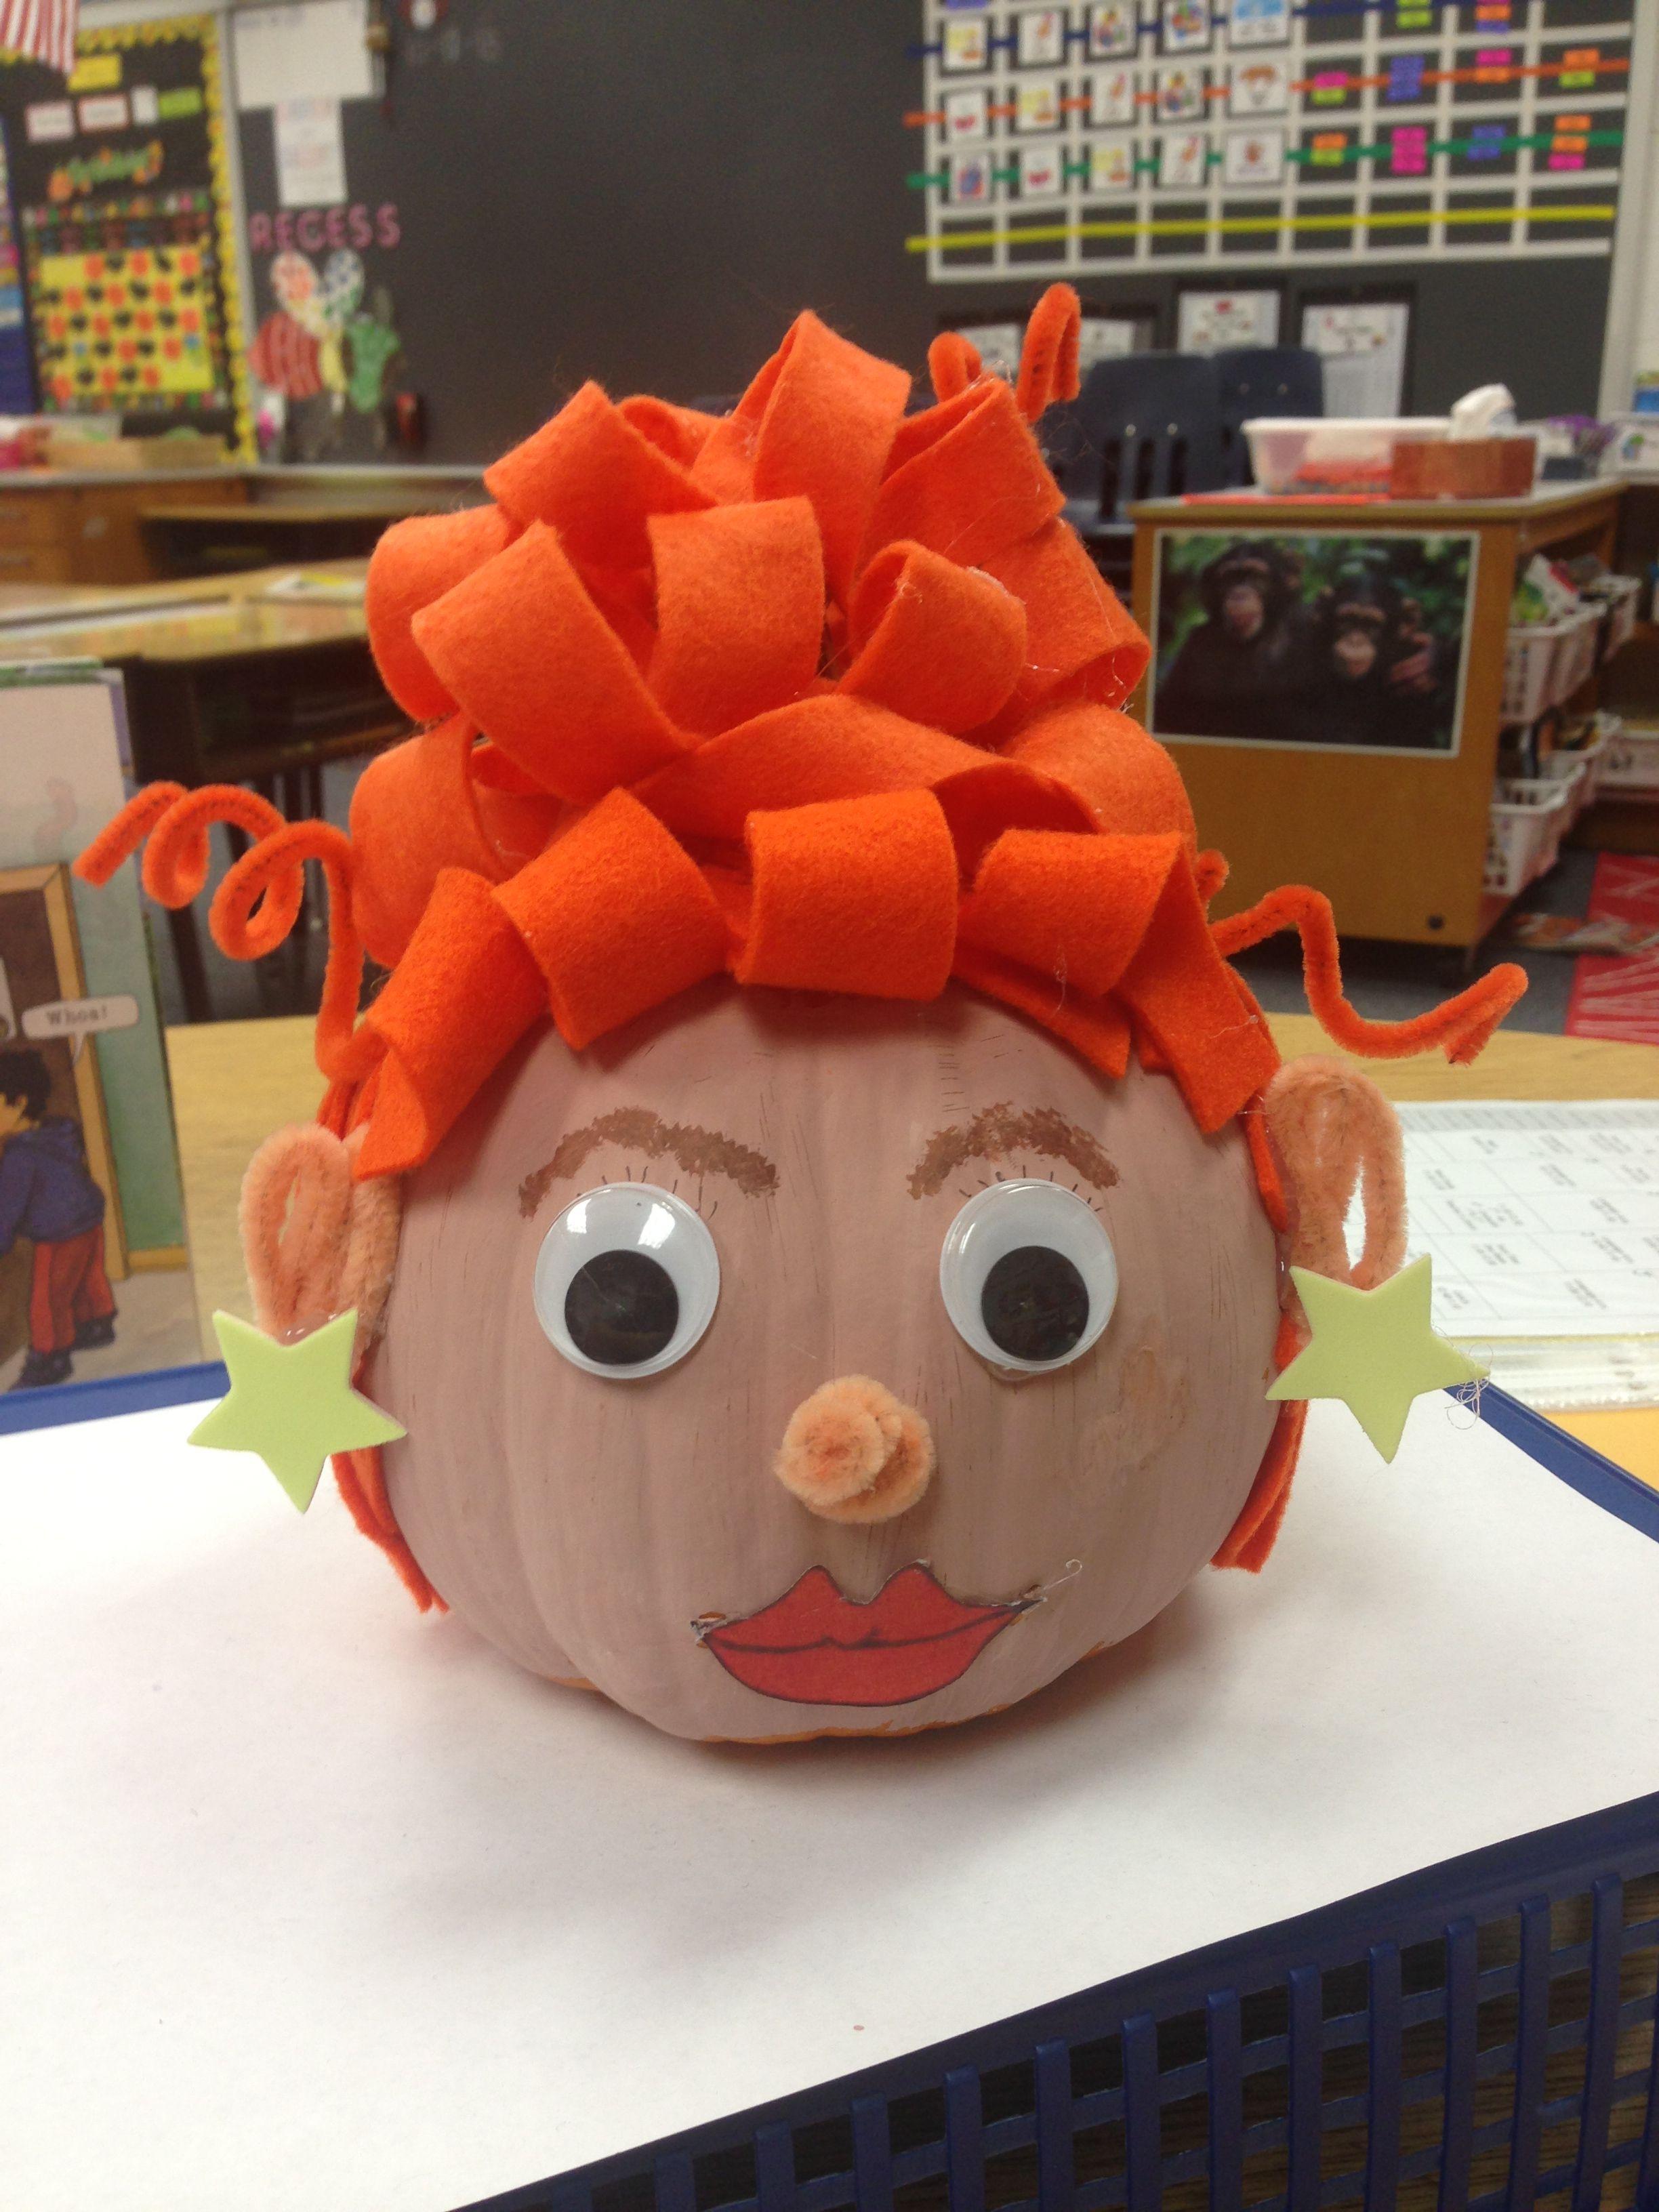 Book Character Pumpkin Ms Frizzle Pumpkin Books Book Character Pumpkins Character Pumpkins